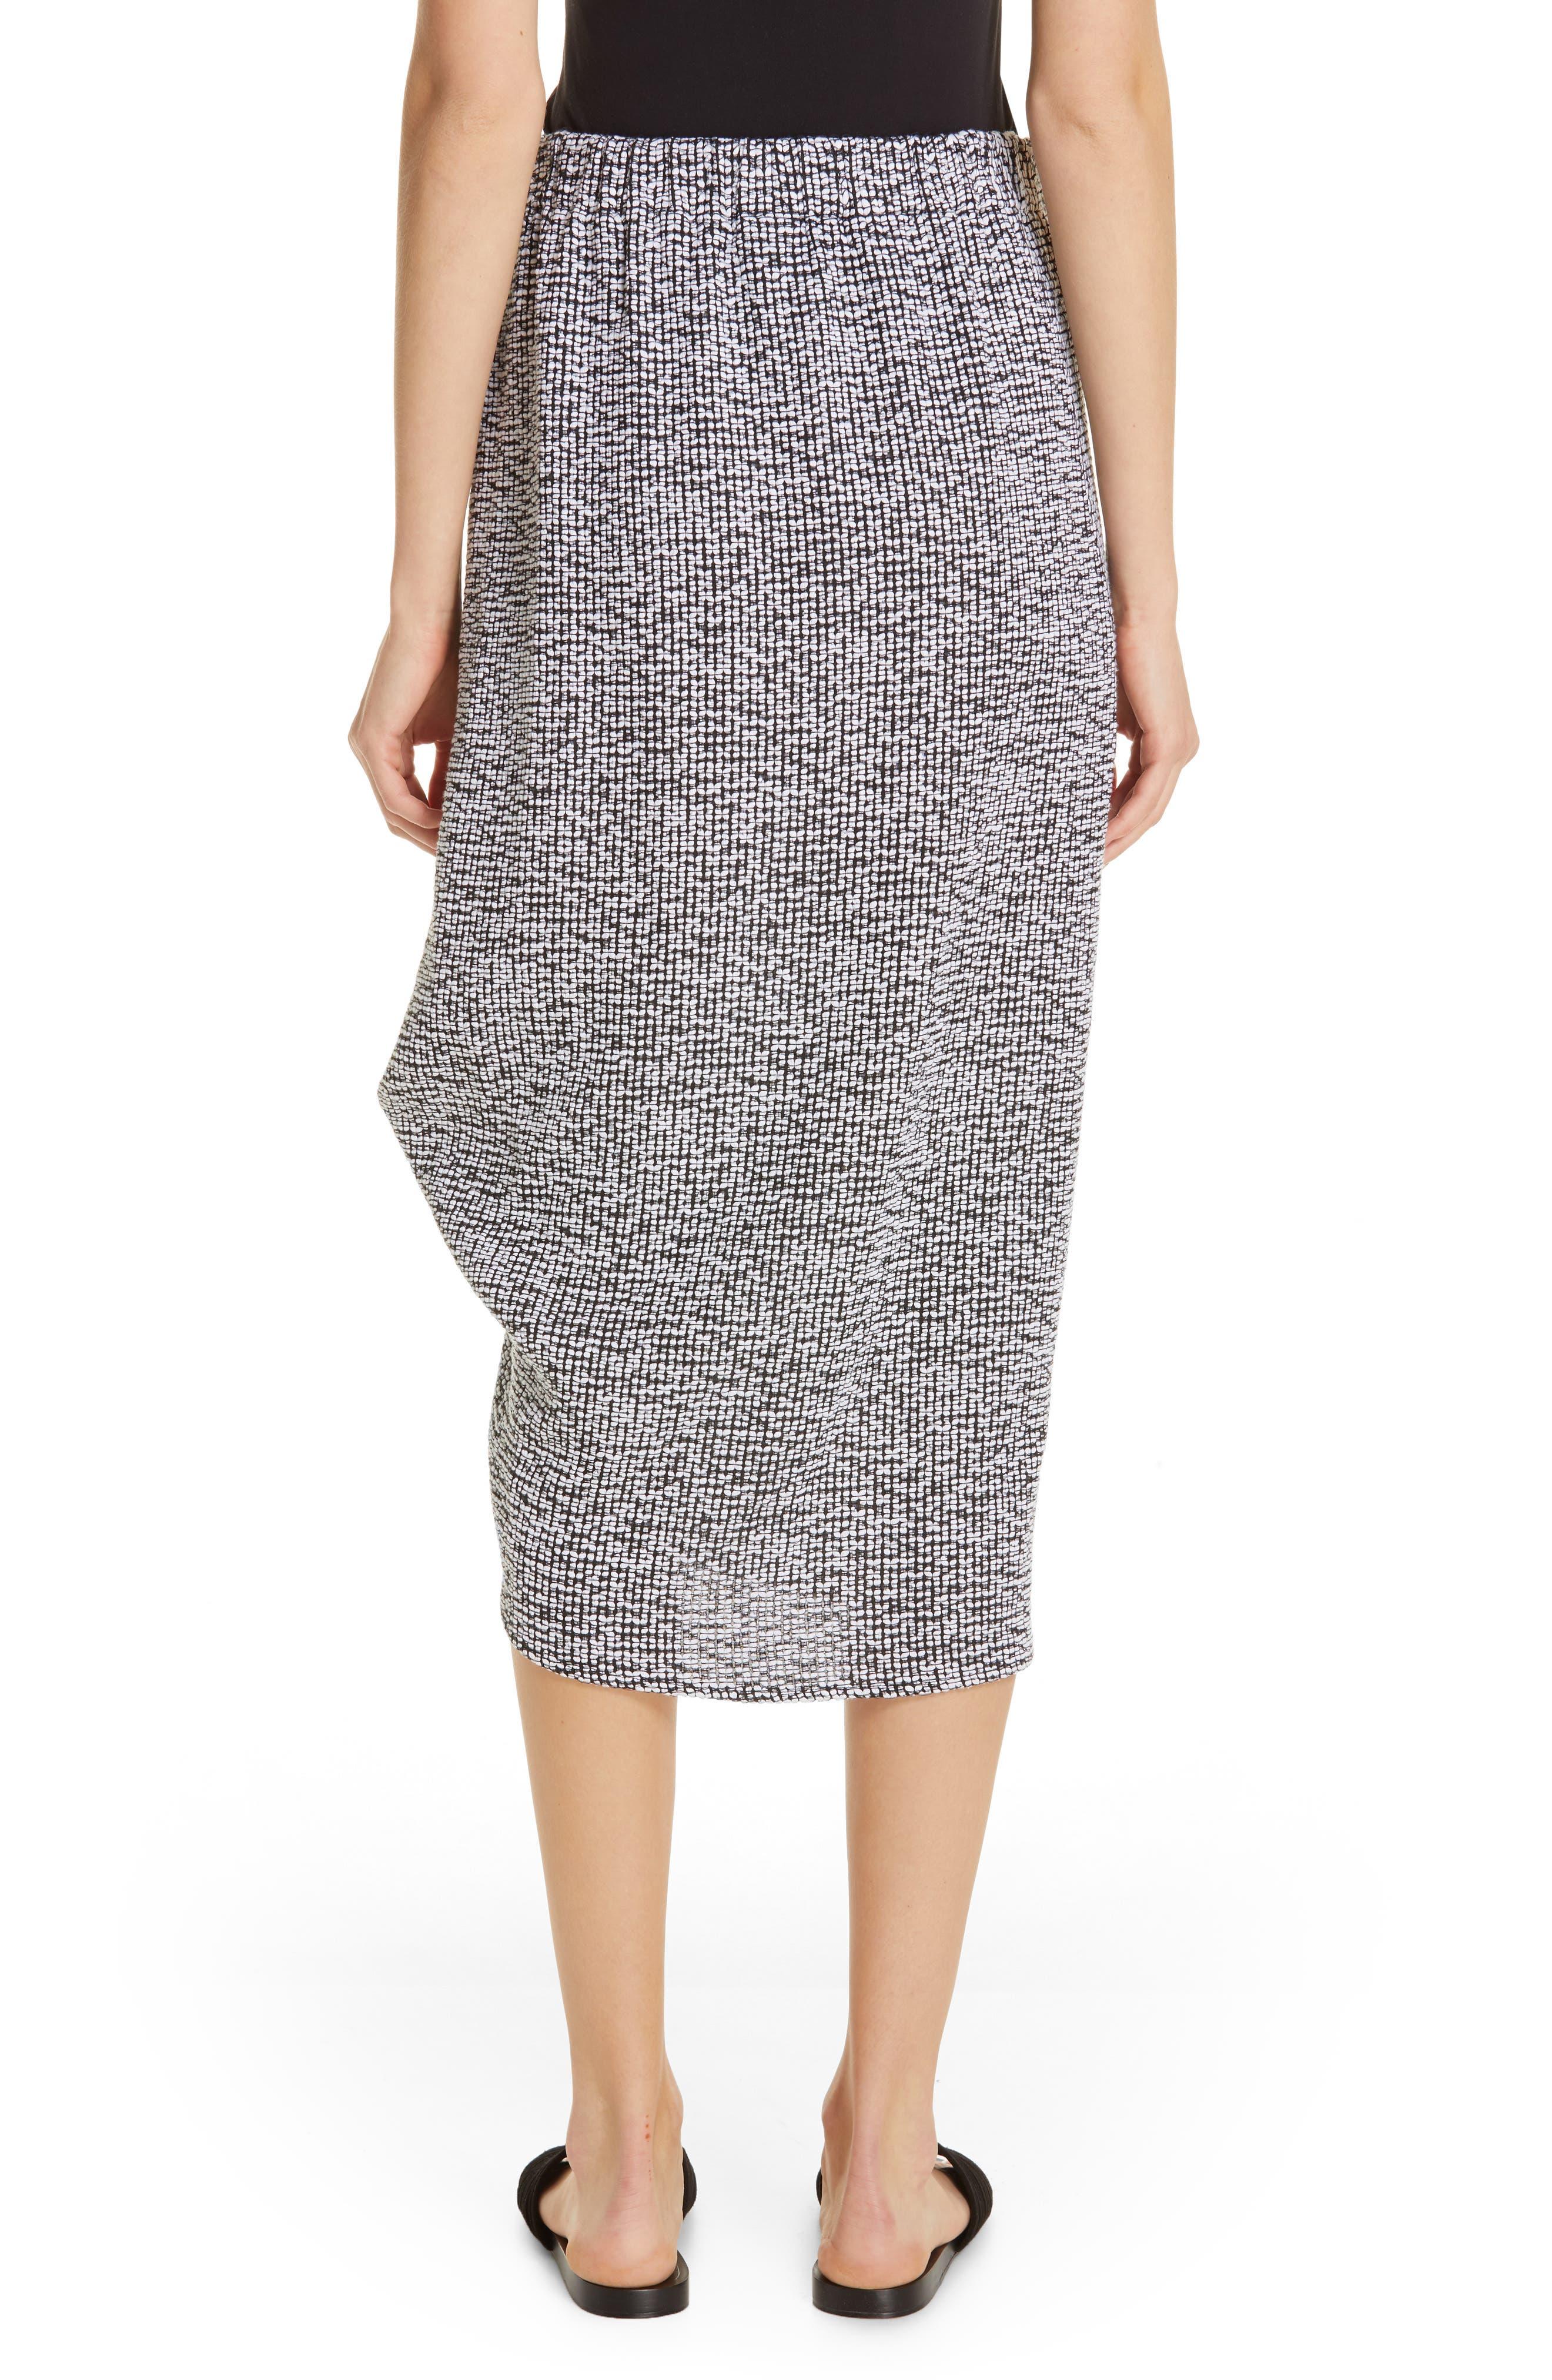 Mio Skirt,                             Alternate thumbnail 2, color,                             WHITE/ BLACK